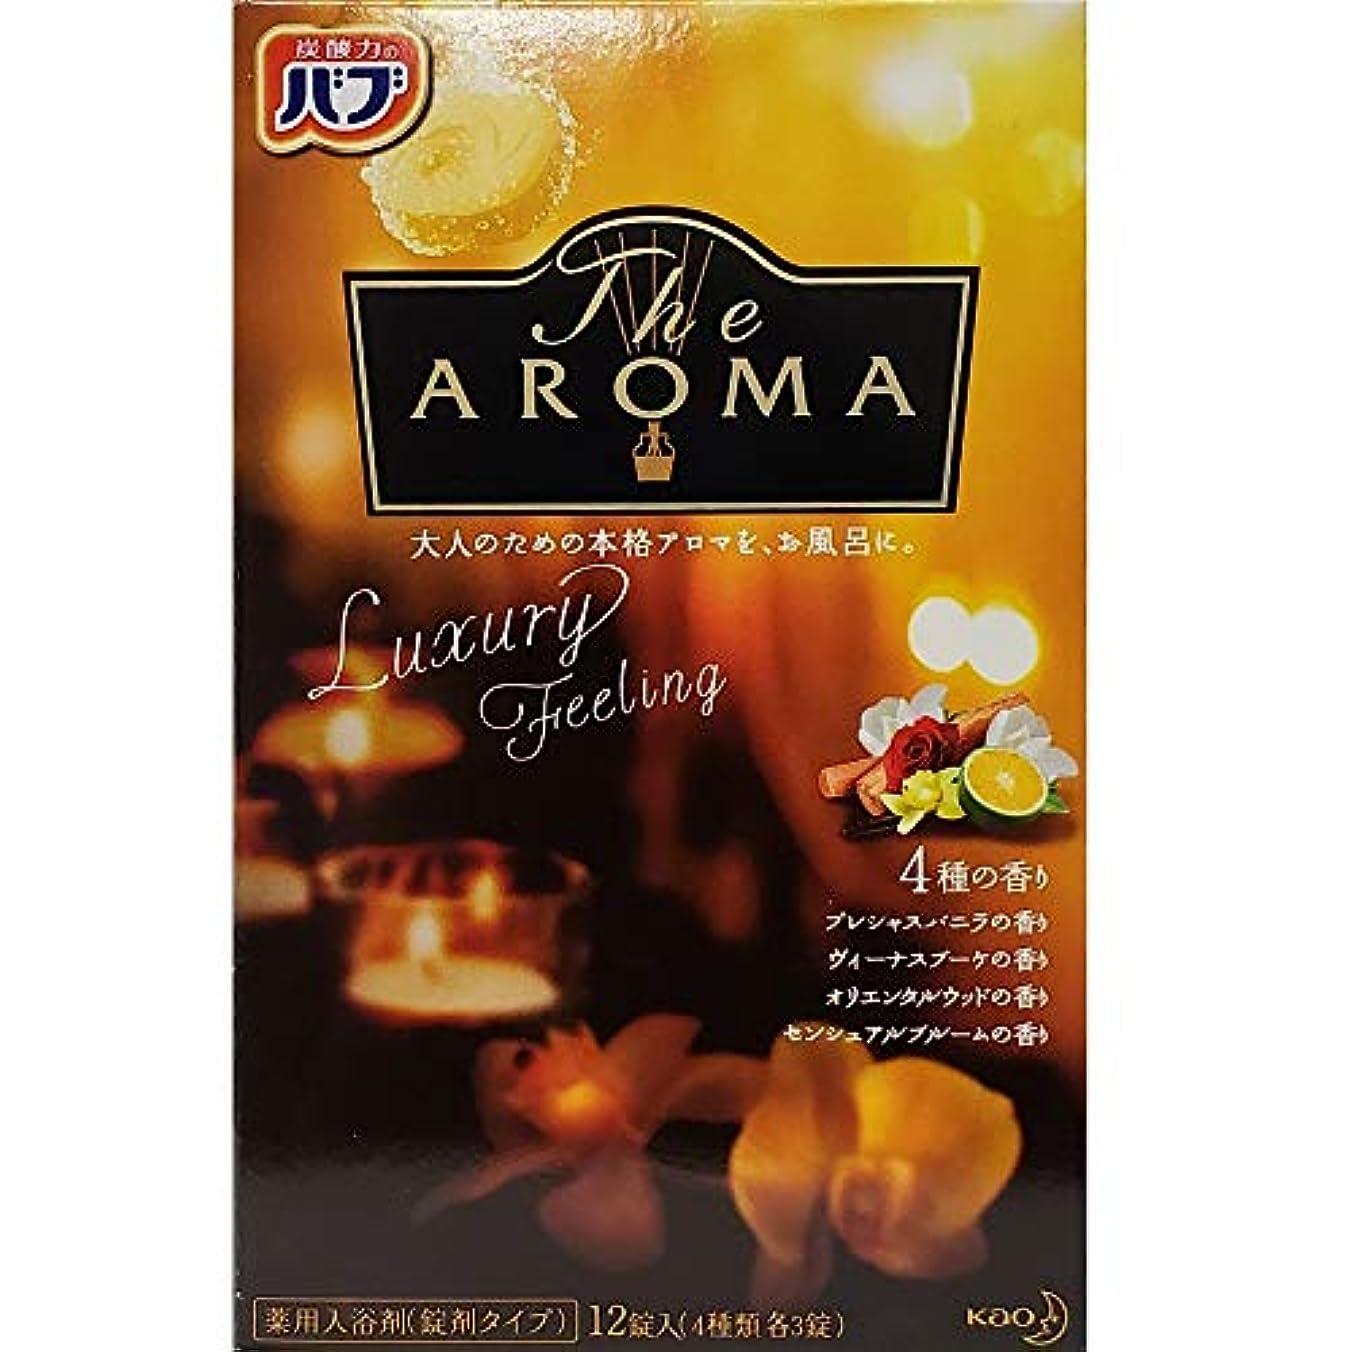 バブ The Aroma Luxury Feeling 40g×12錠(4種類 各3錠) 医薬部外品